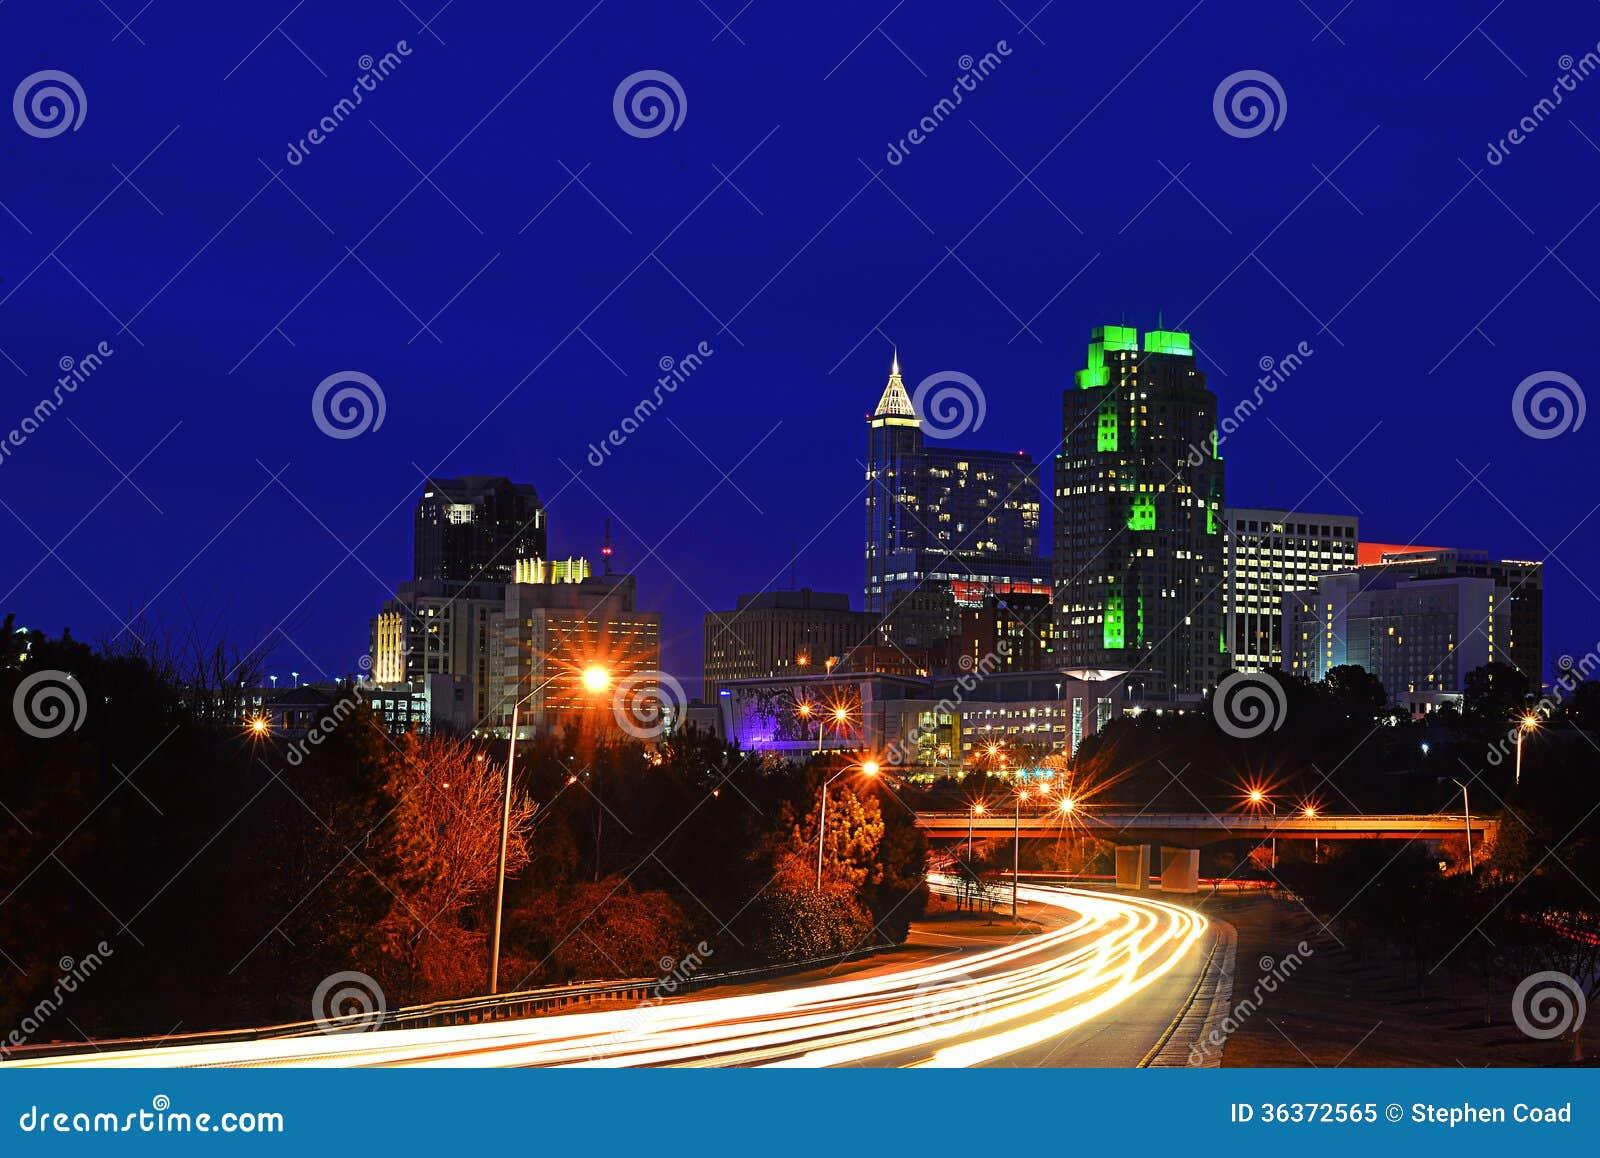 Raleigh After Dark stock image  Image of carolina, traffic